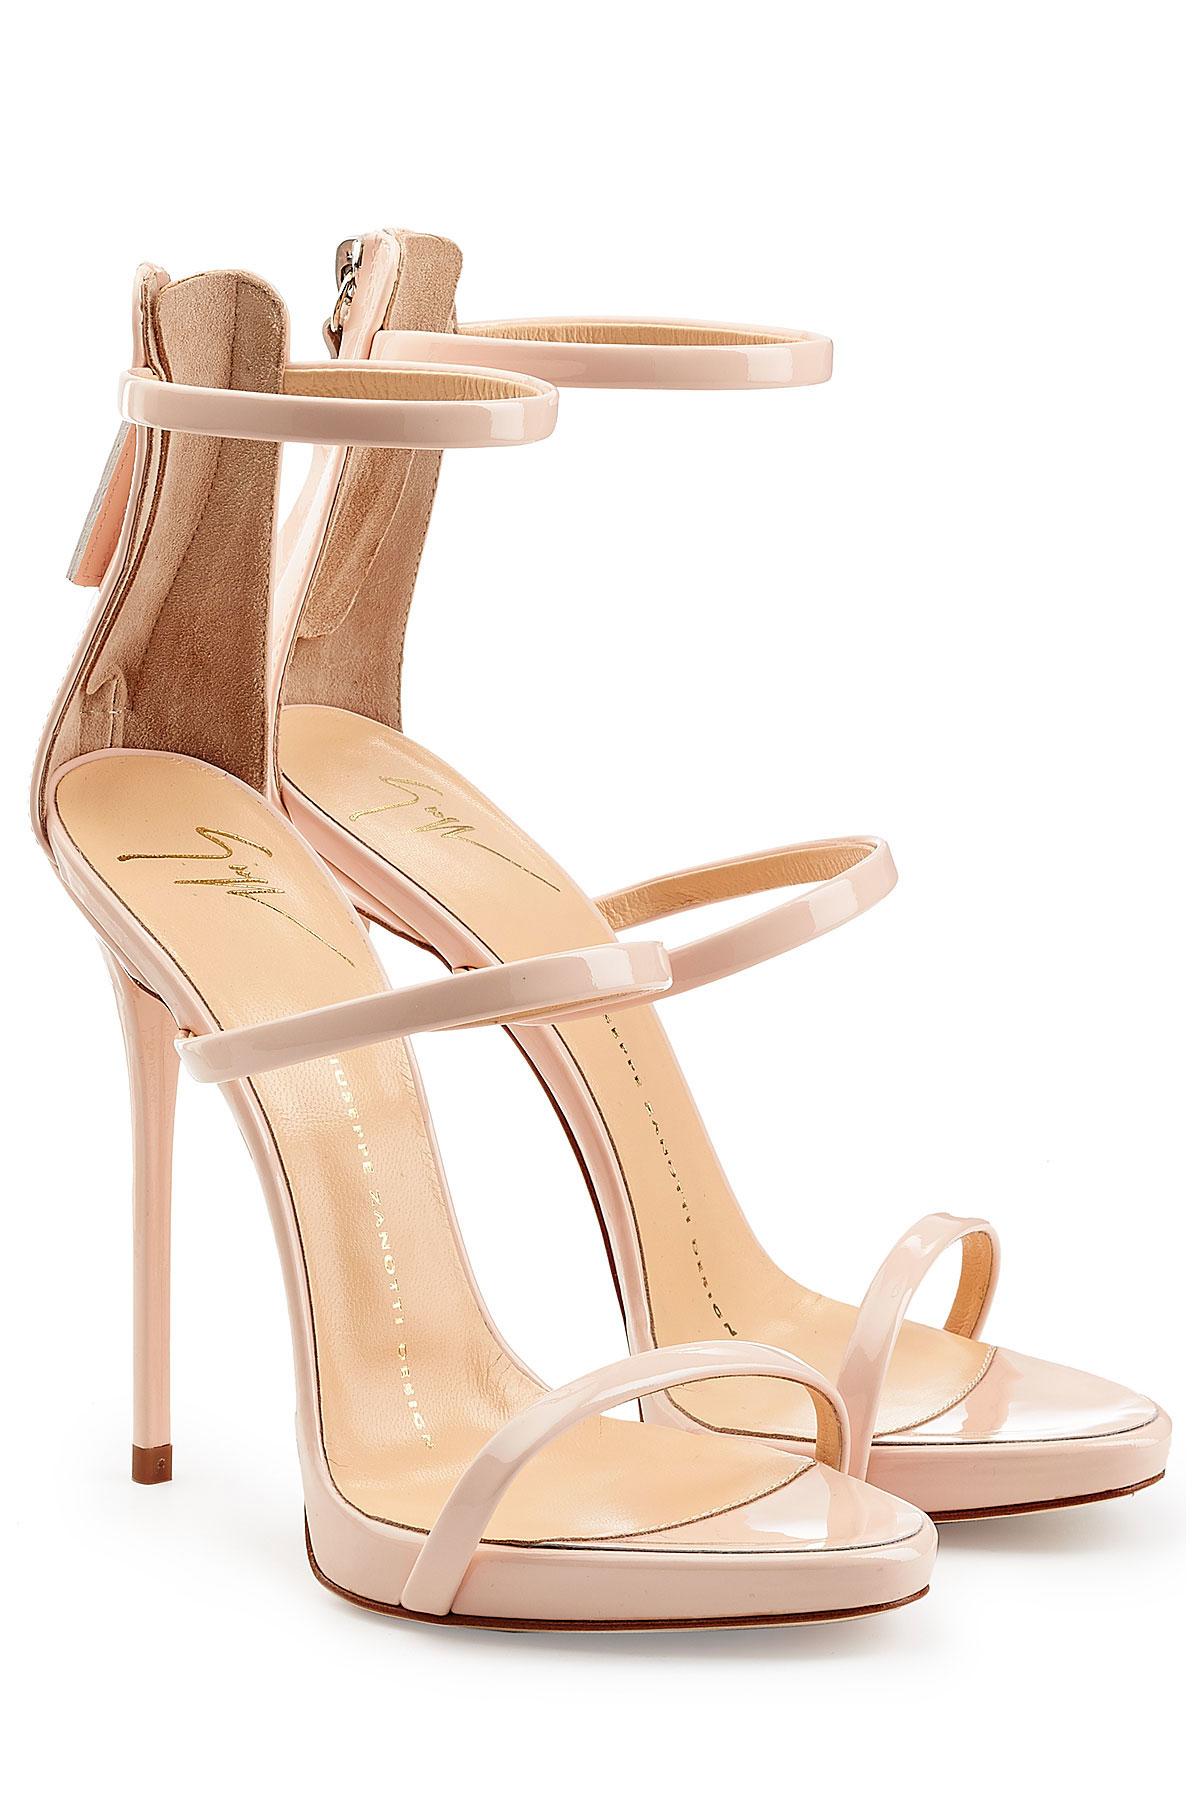 giuseppe strappy sandals Kim Kardashian Sale